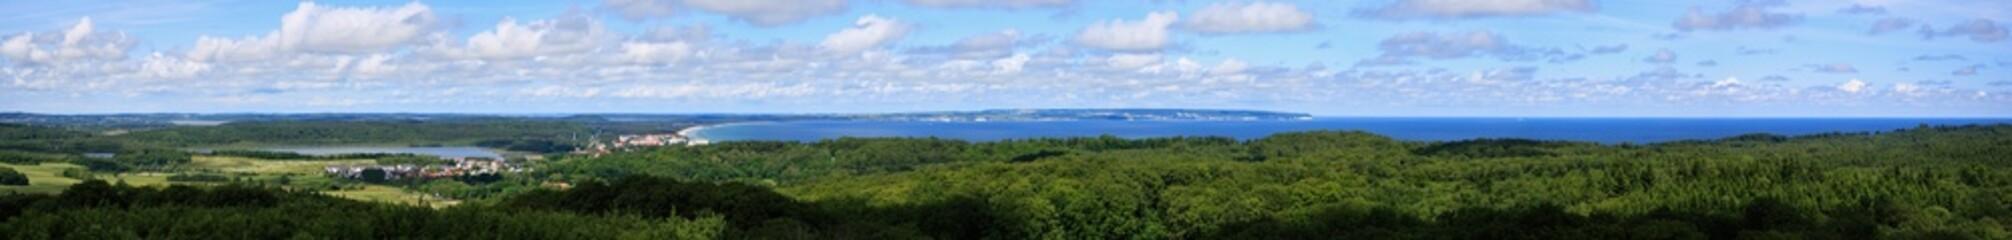 Insel Rügen Panorama